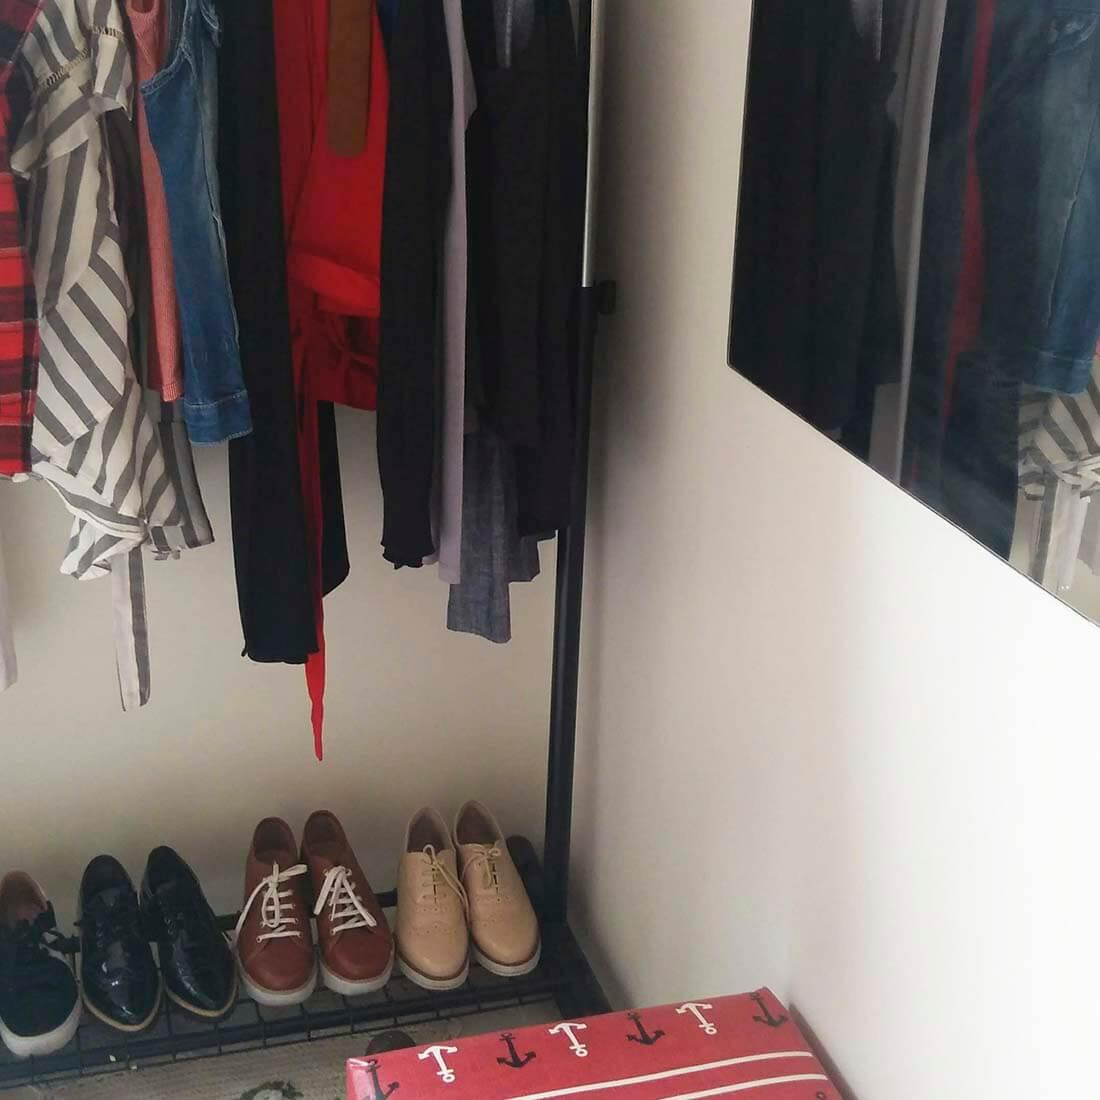 A analogia do guarda-roupa